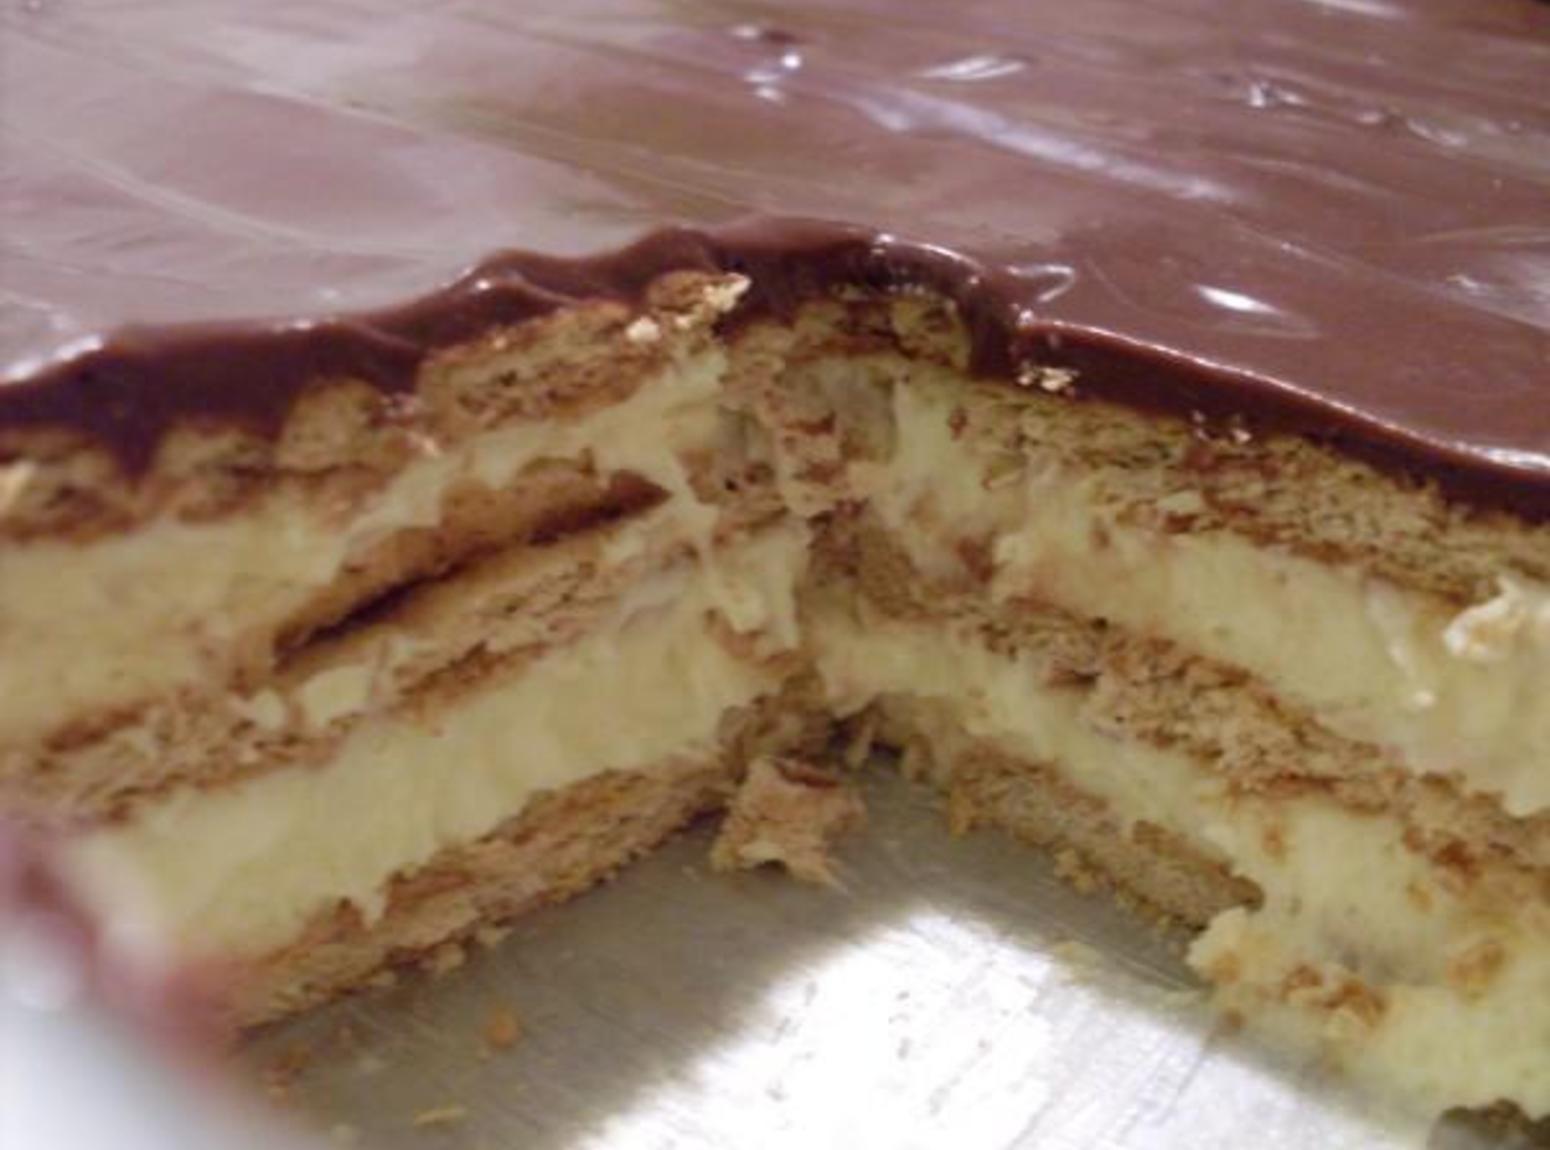 Graham Cracker Dessert  Graham Cracker Pudding Recipe